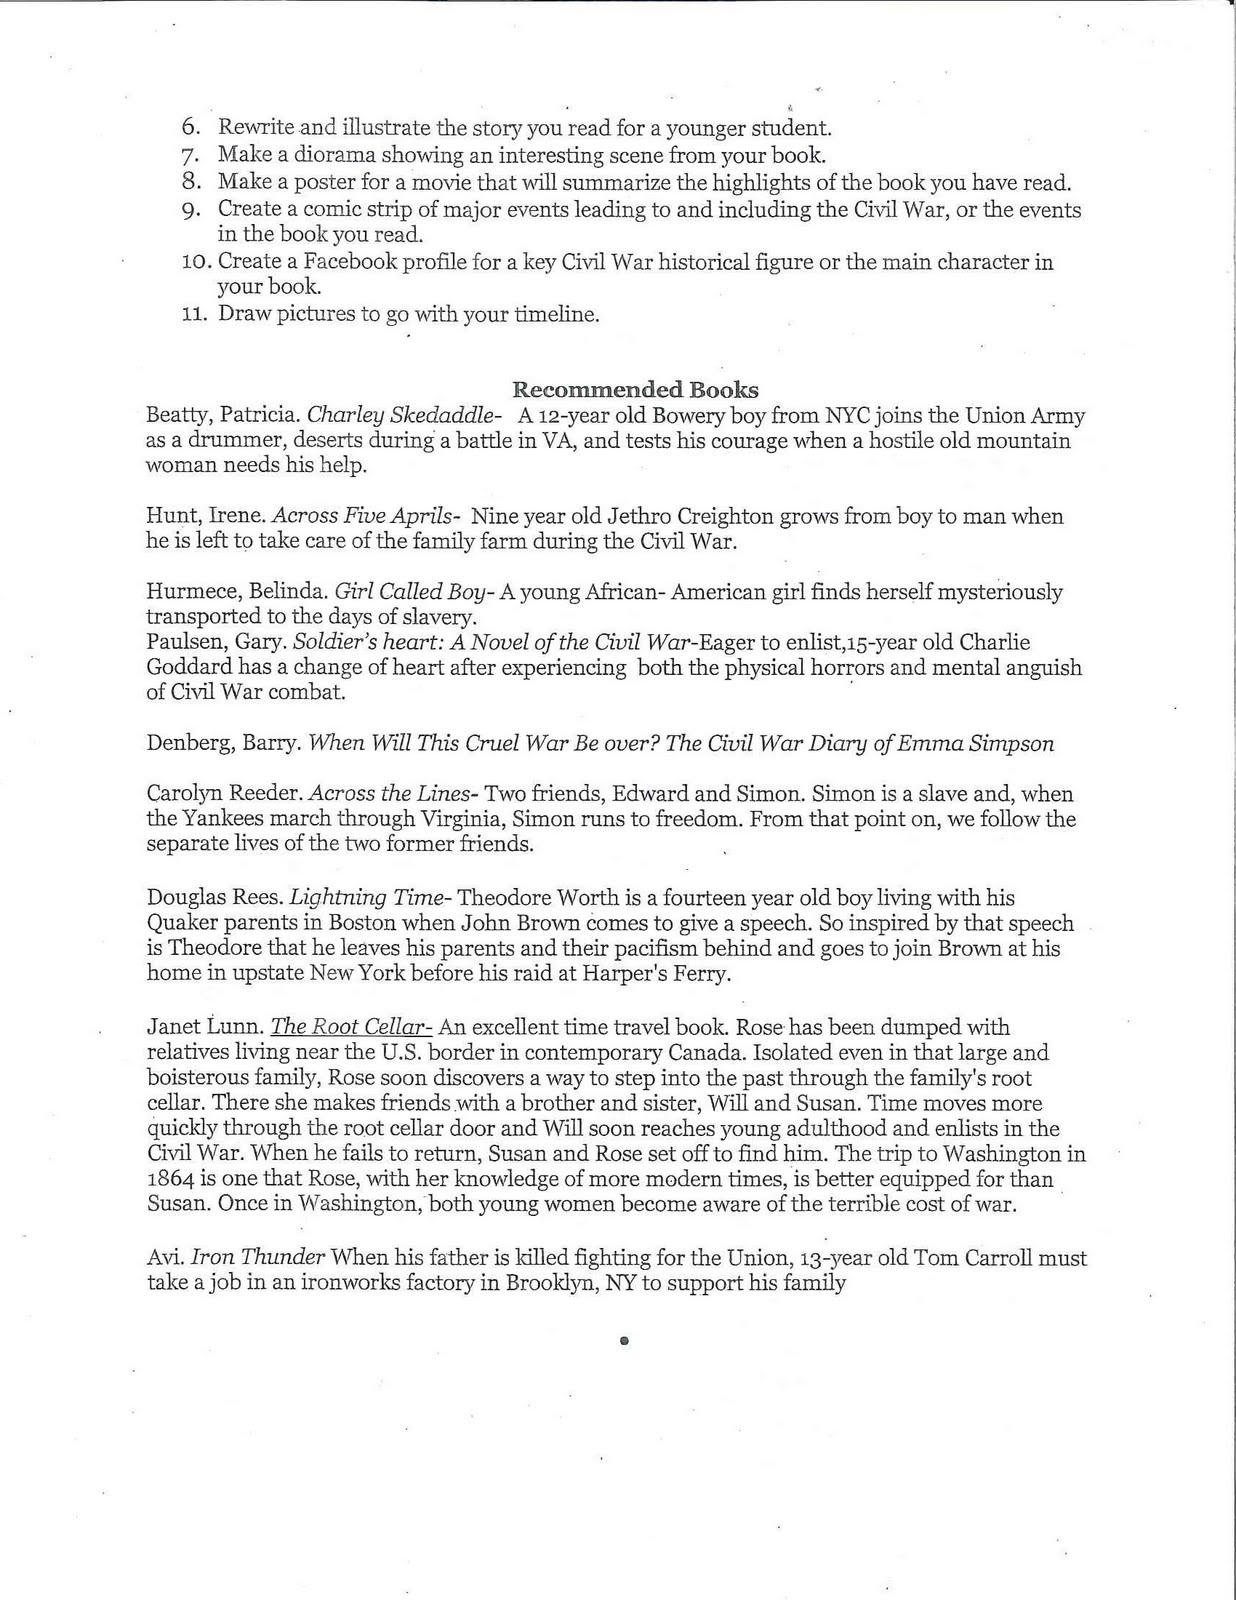 5th Grade Language Arts and Reading – Phantom Tollbooth Worksheets